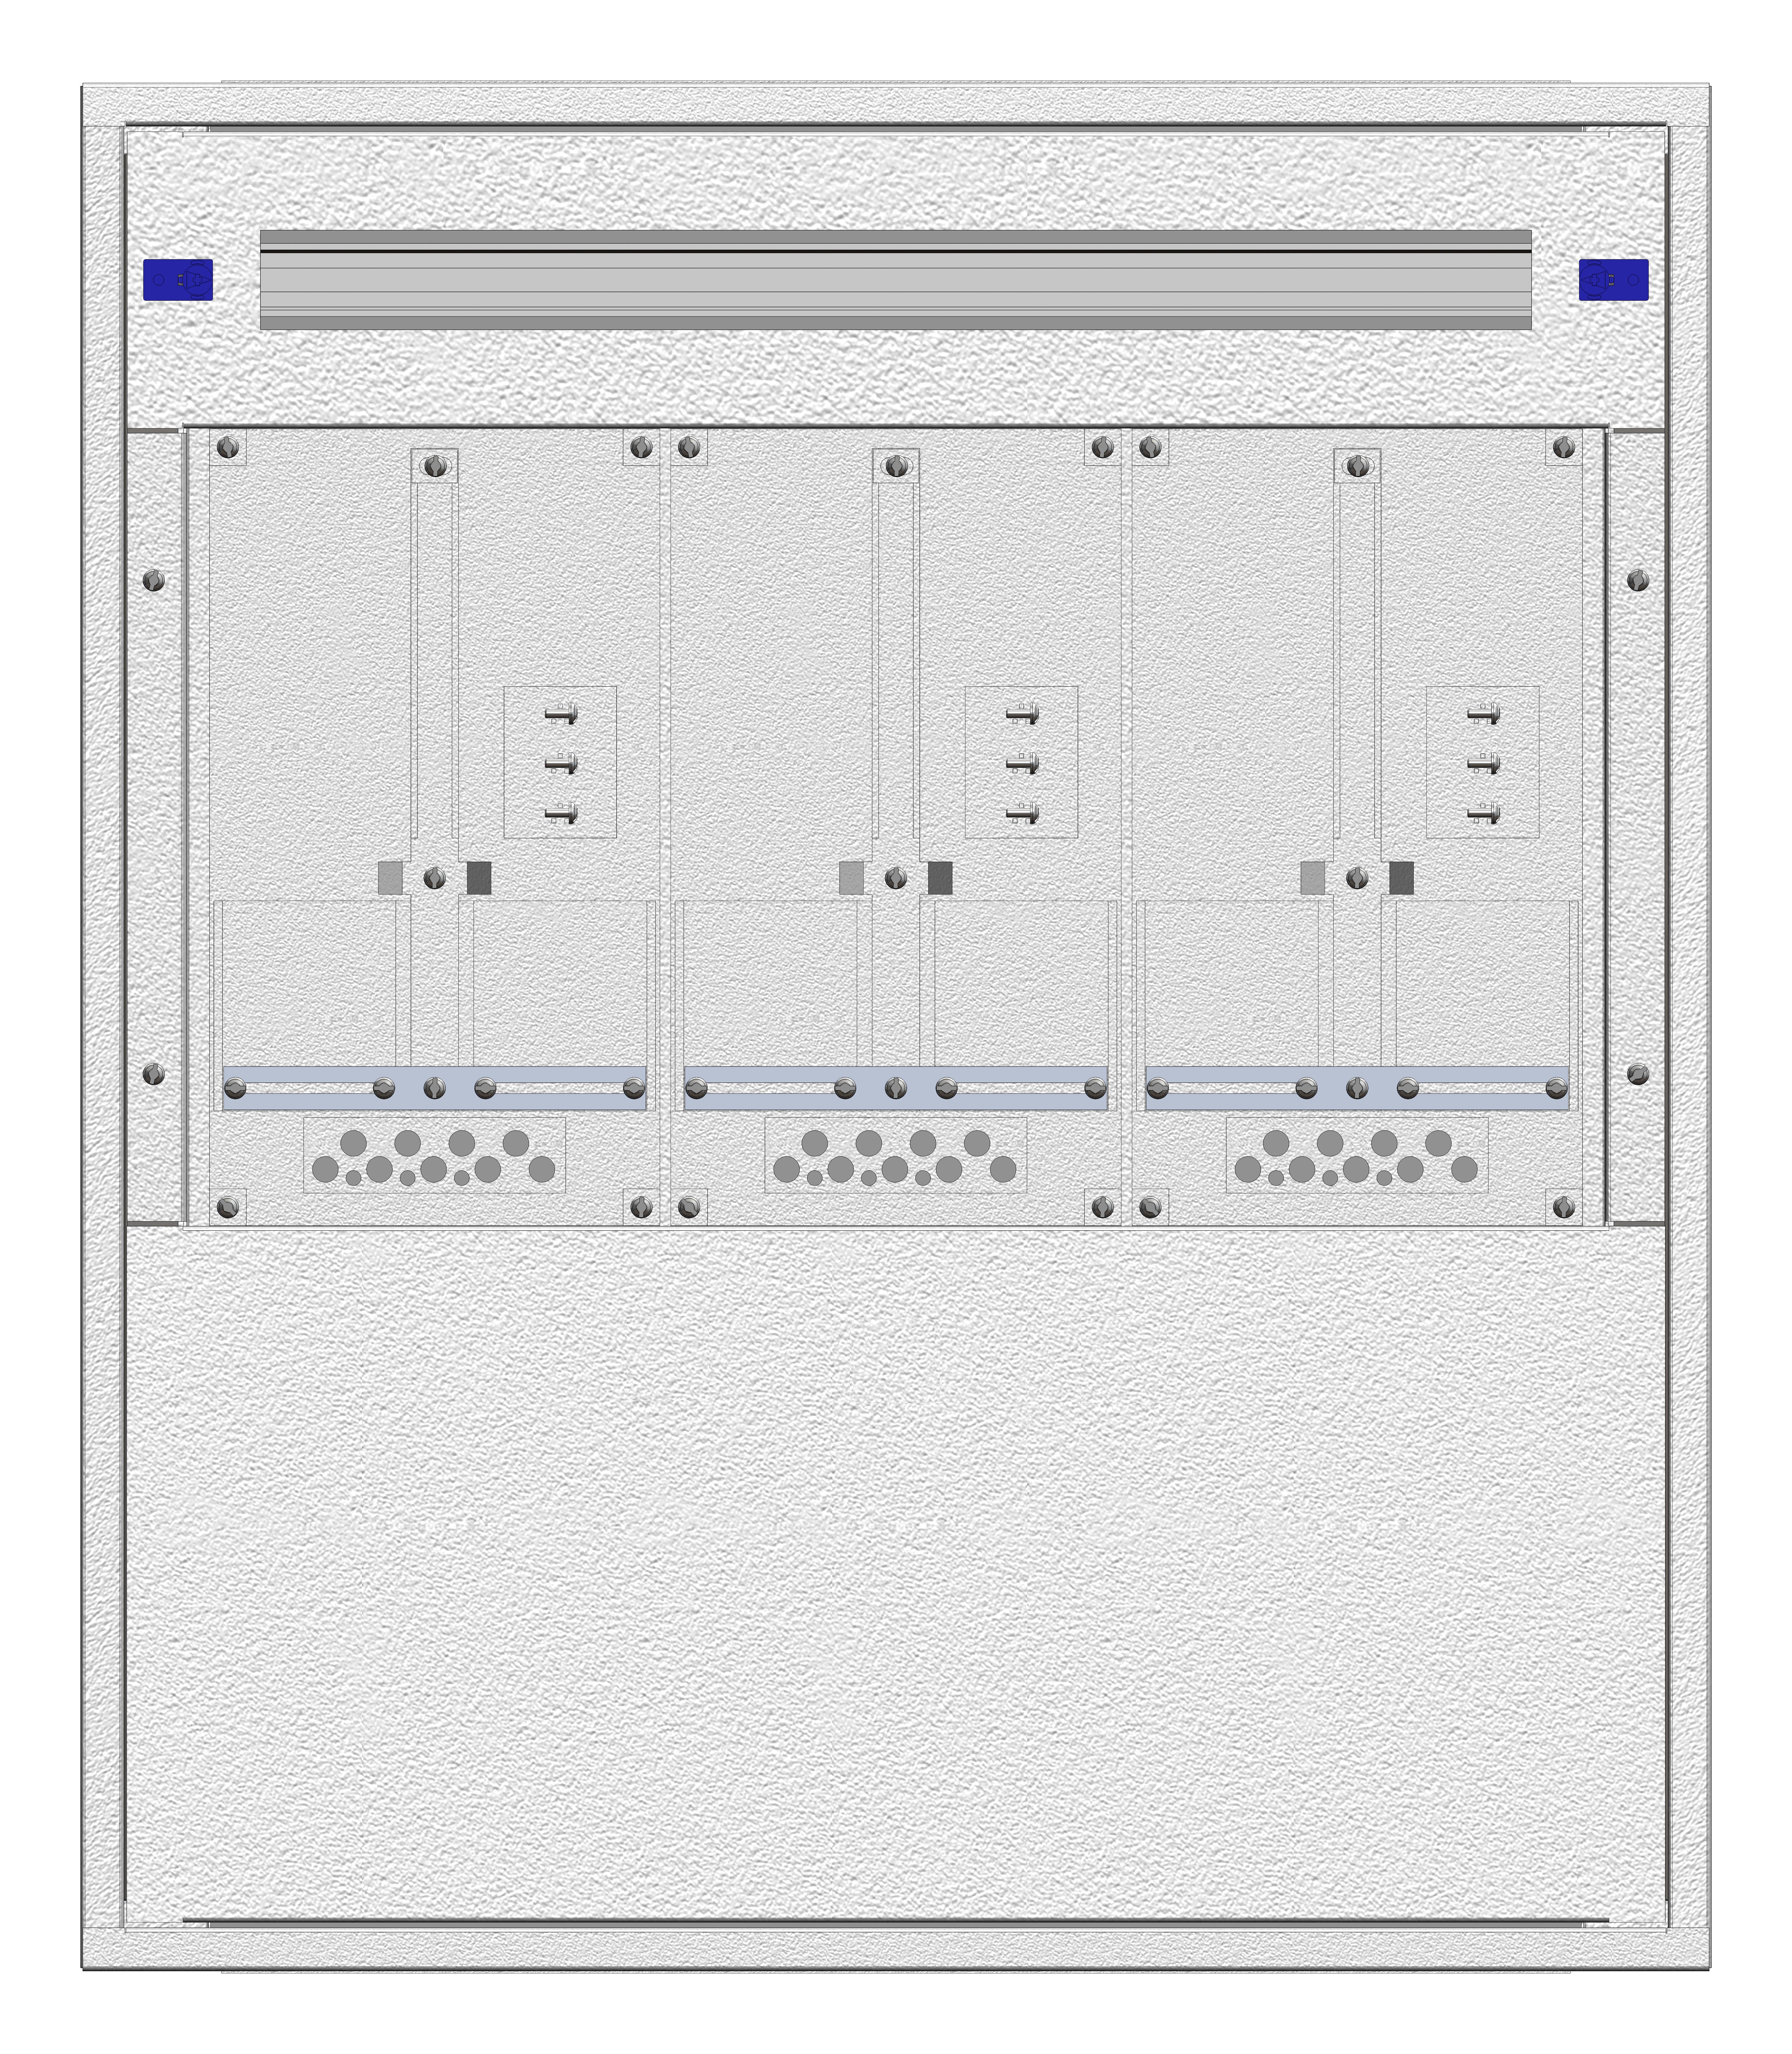 1 Stk Aufputz-Zählerverteiler 3A-18E/NOE 3ZP, H915B810T250mm IL160318NS